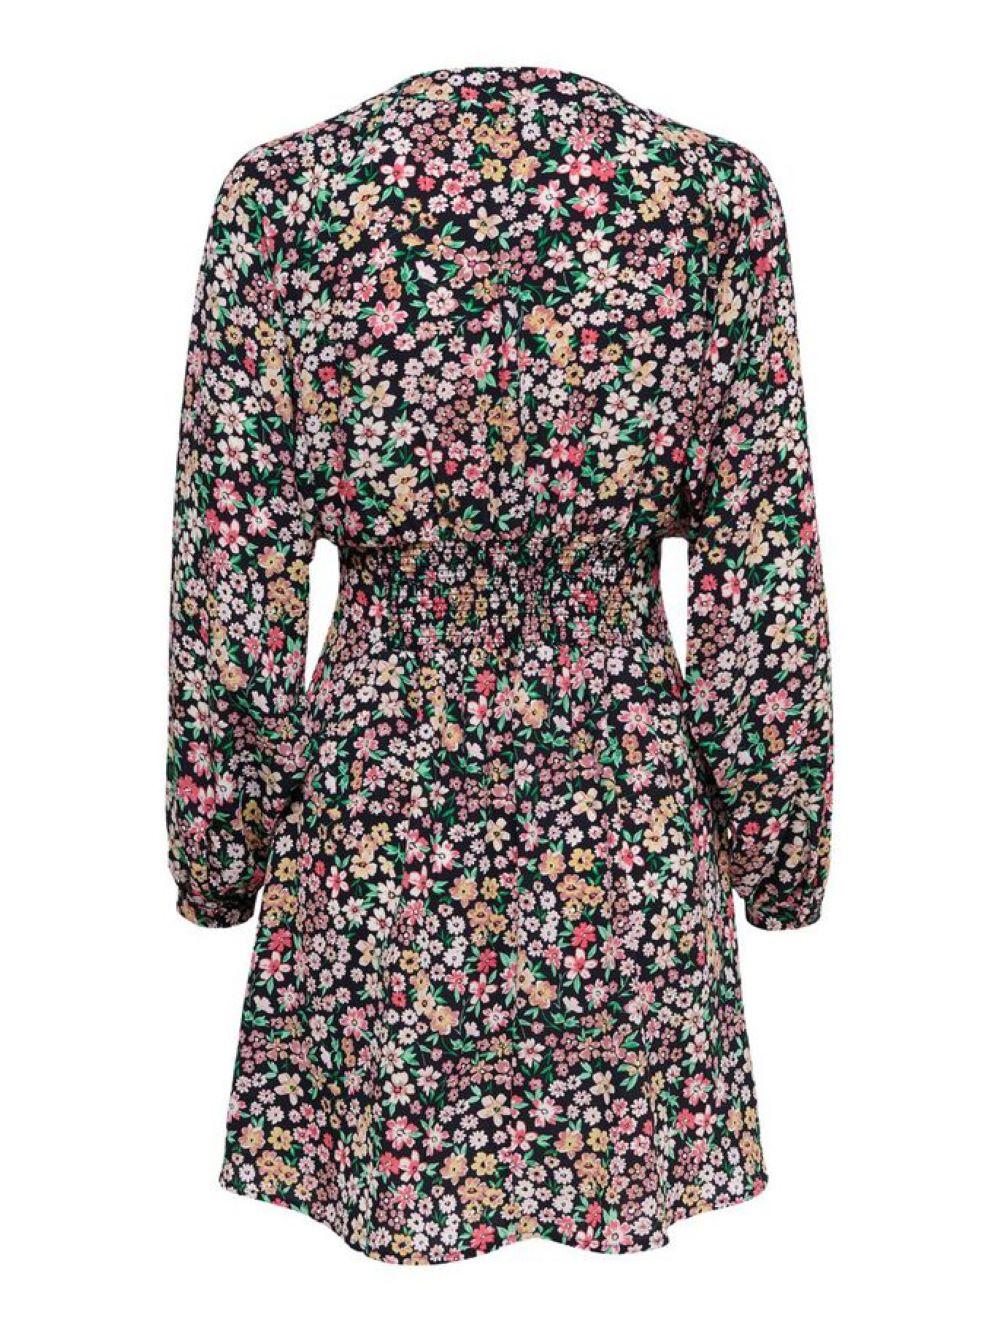 ONLY | Dress | 15221091NIGHTSKYSHORE FLOWER